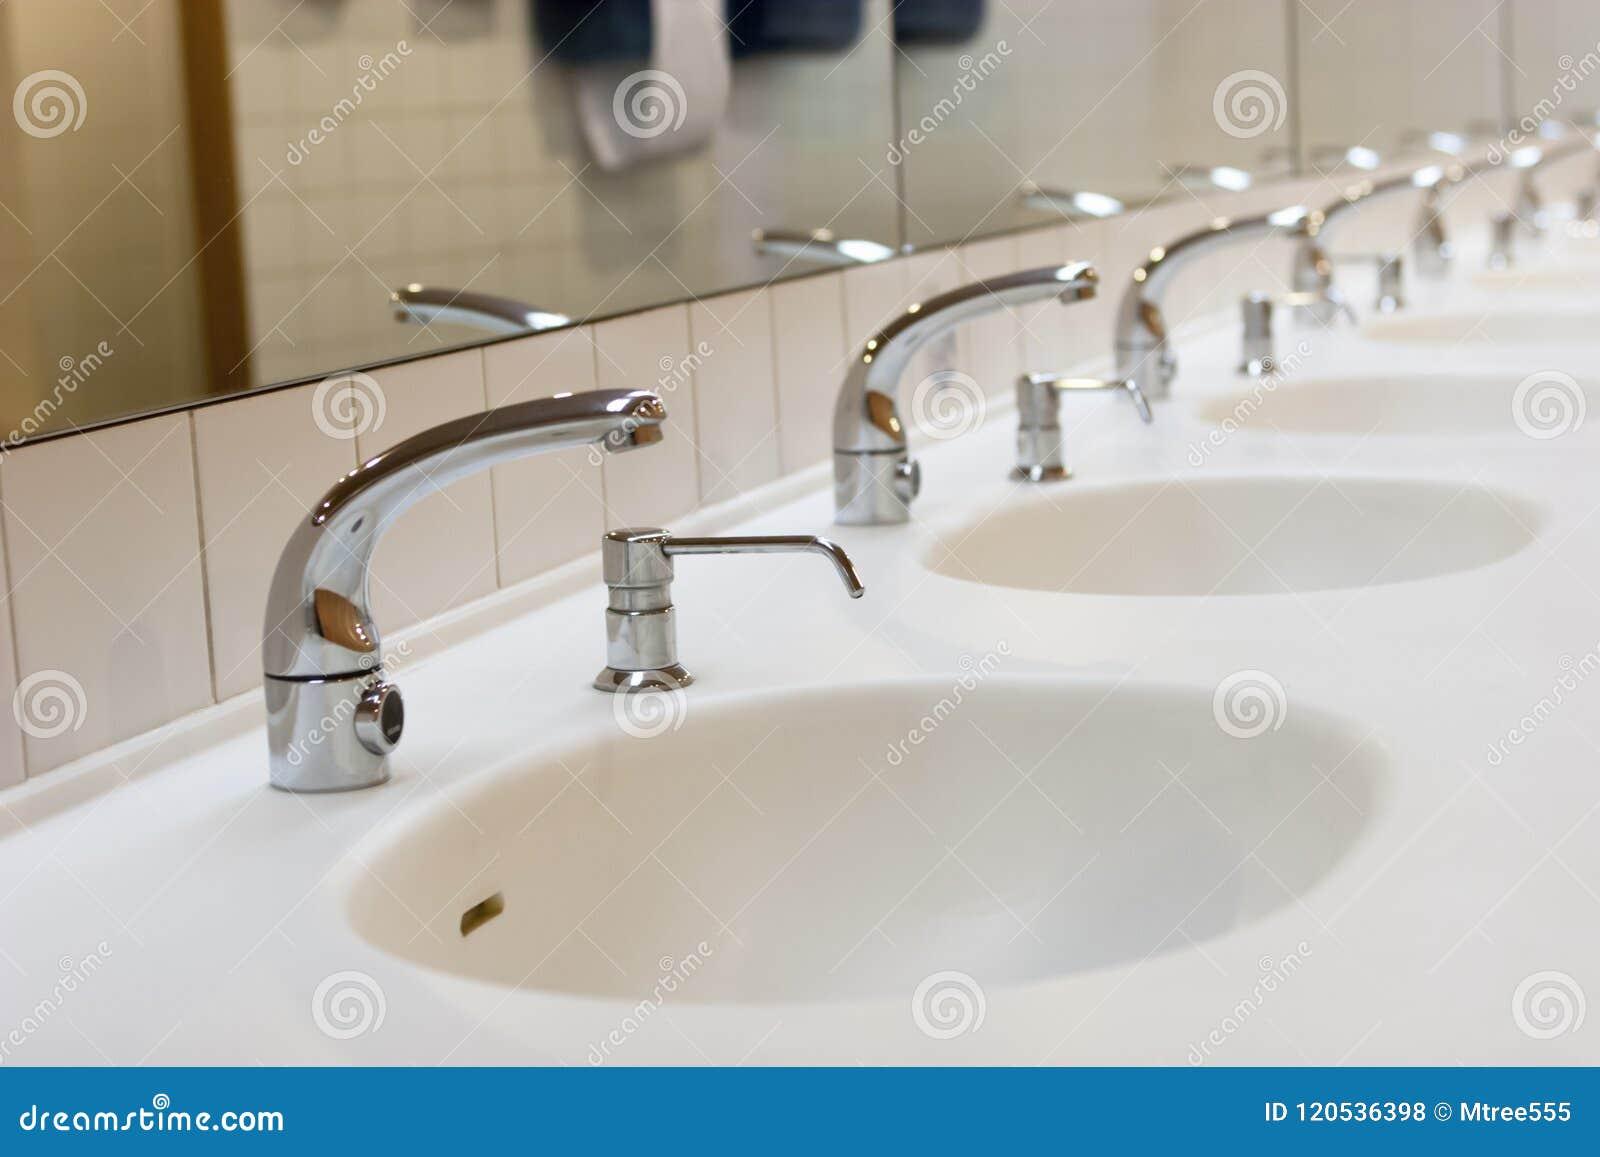 Washroom public toilet stock photo. Image of restroom - 120536398